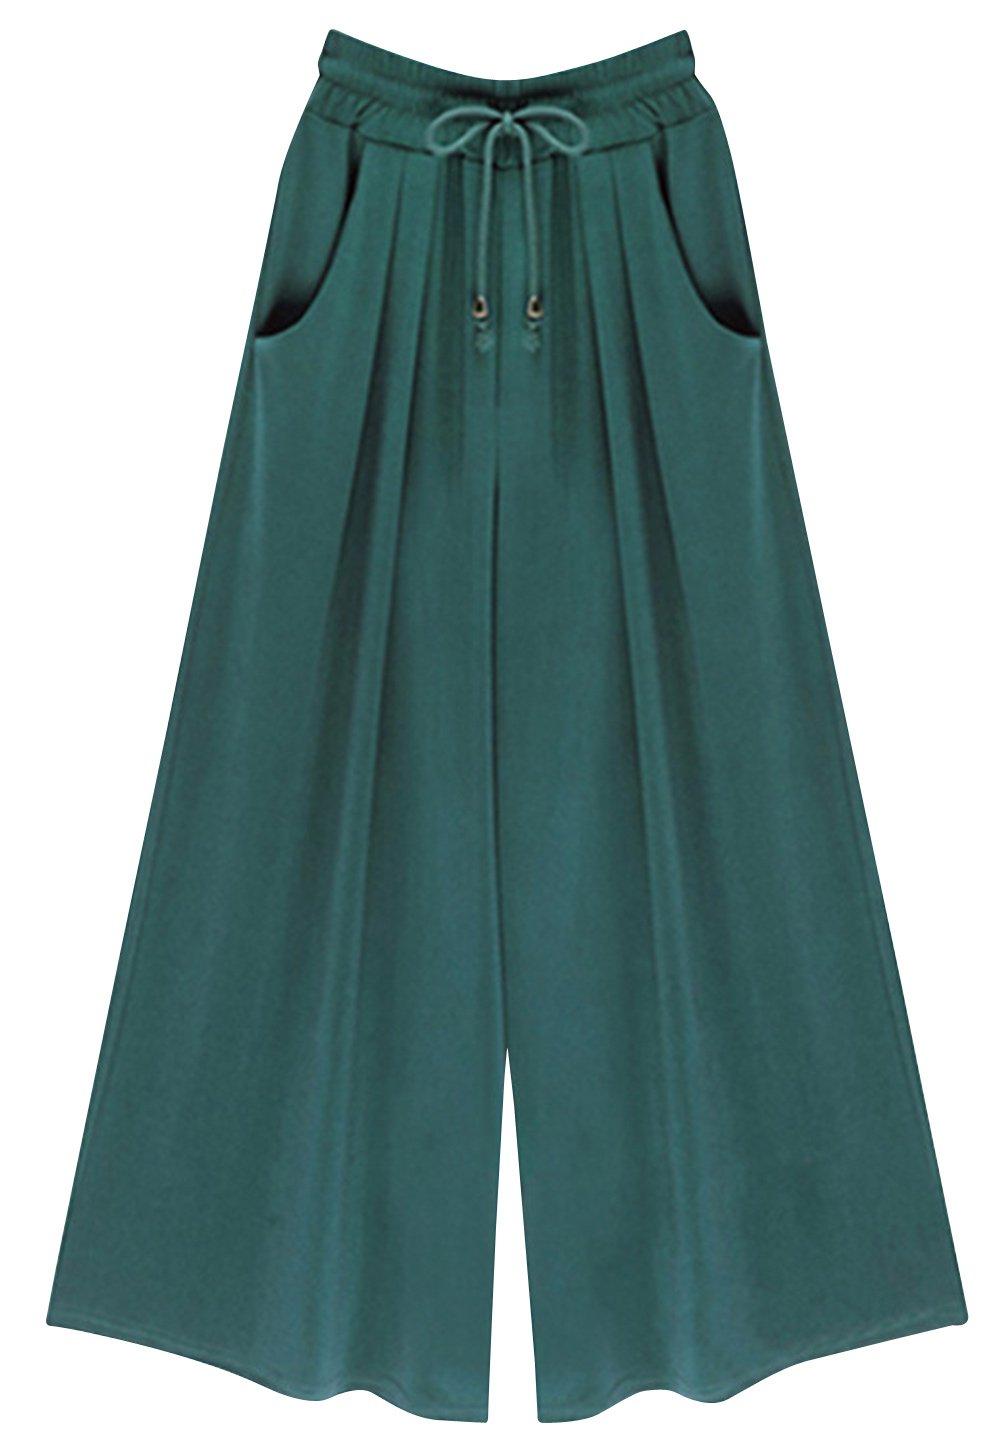 FEOYA Wide Leg Pants Womens Casual Loose Fit Elastic High Waist Palazzo Pants Long Blackish Green 2XL